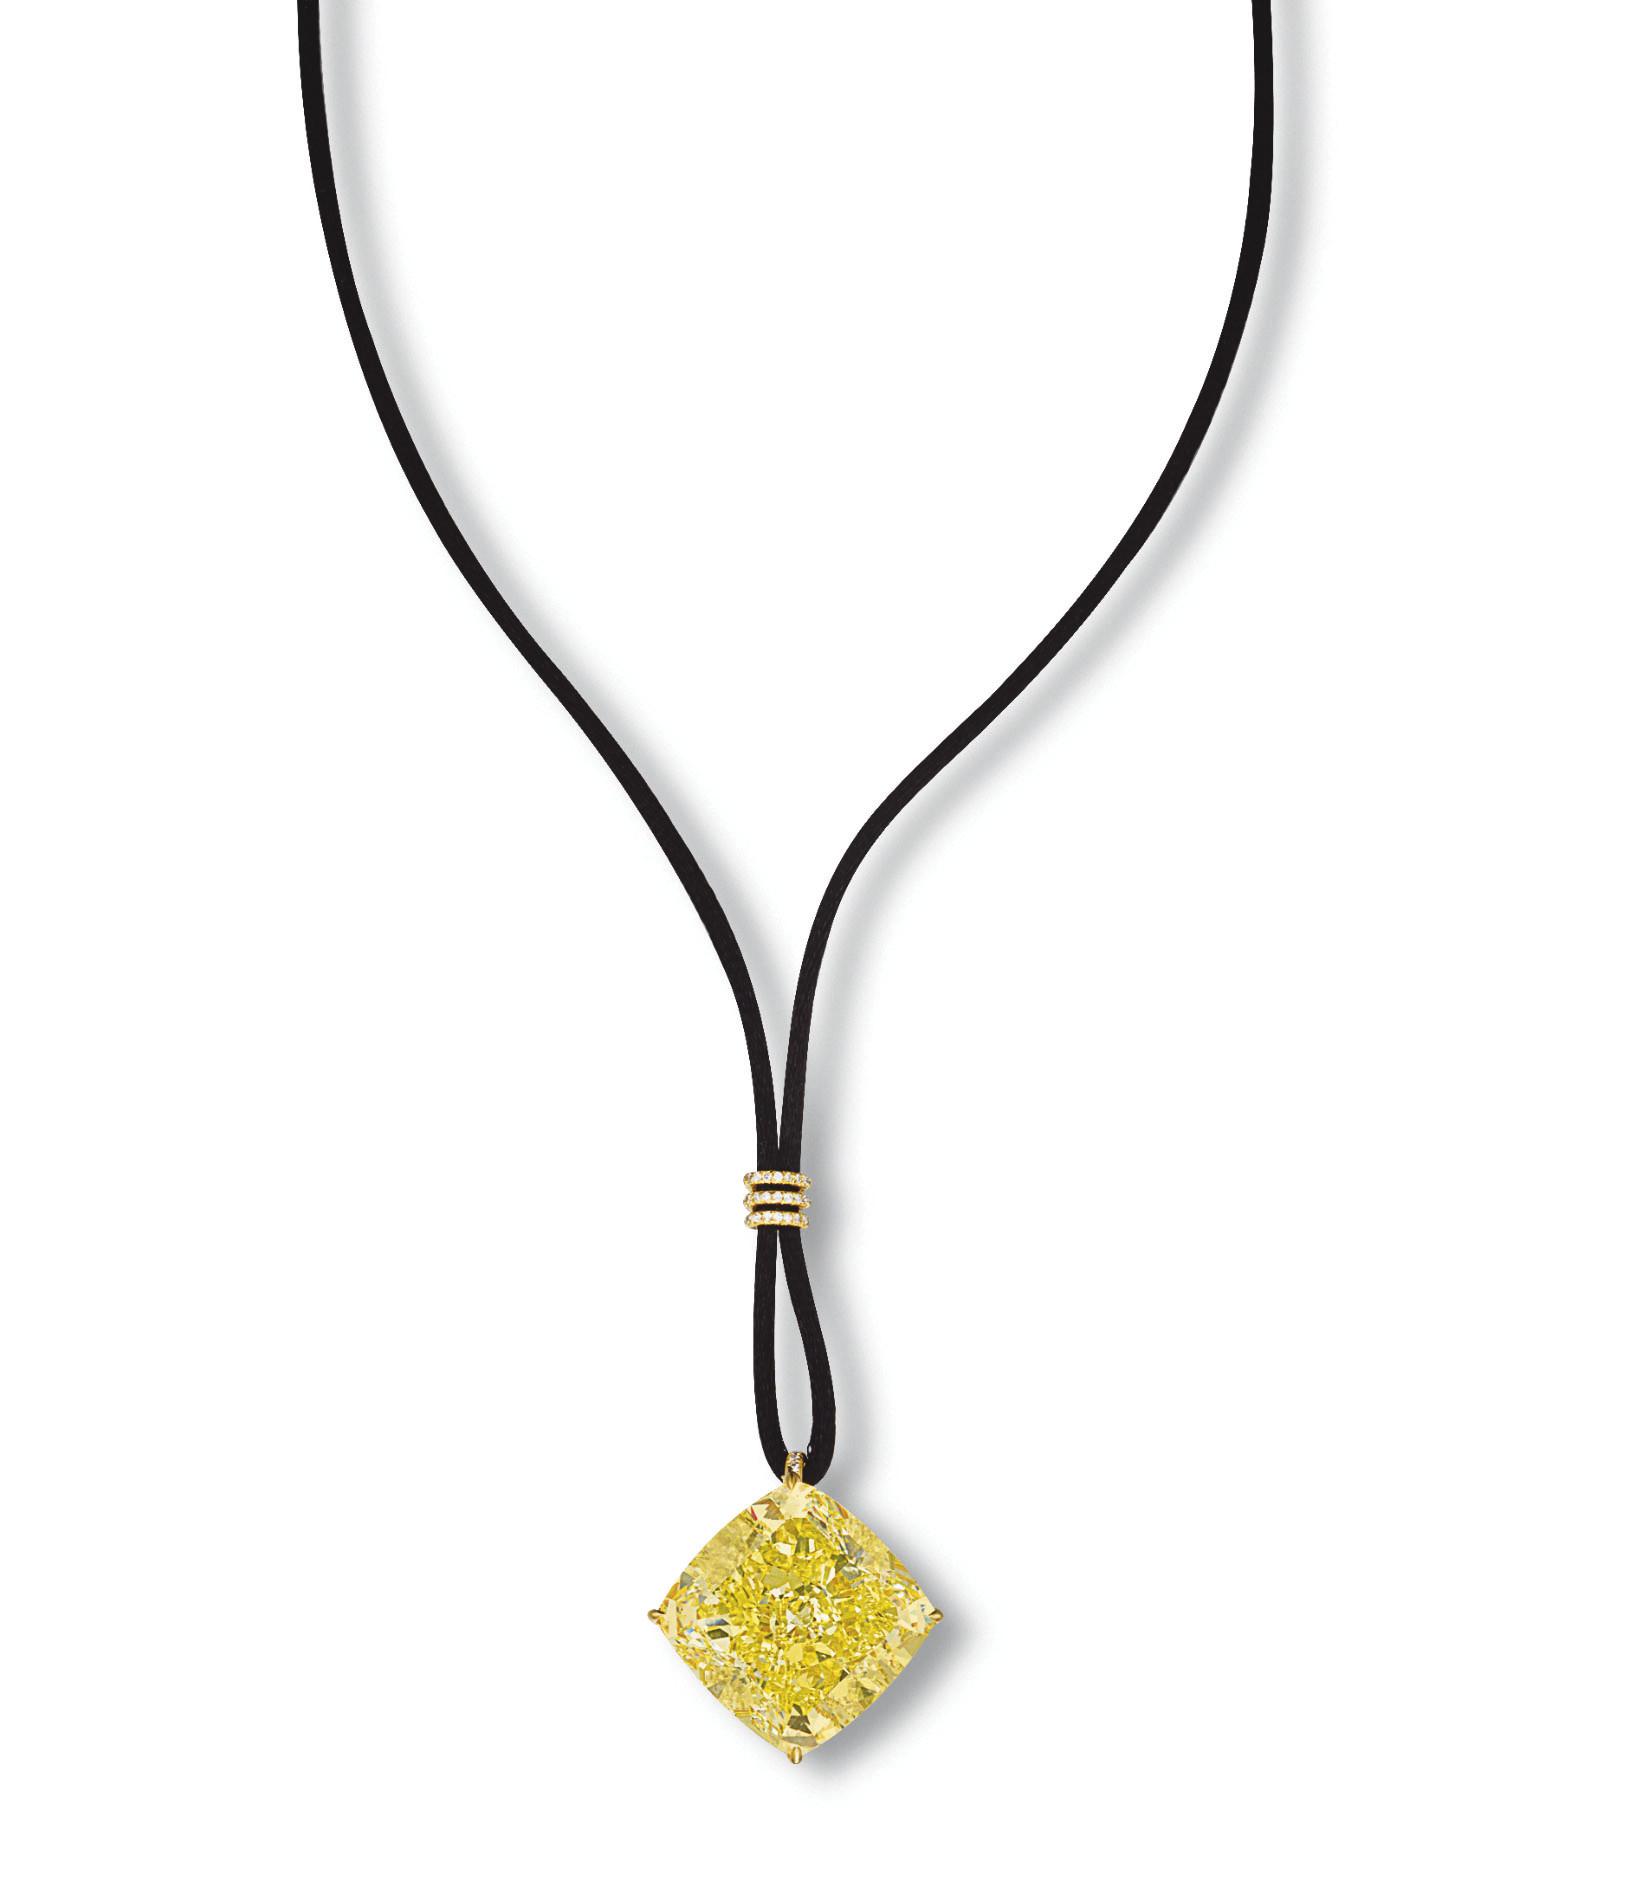 AN IMPORTANT COLOURED DIAMOND